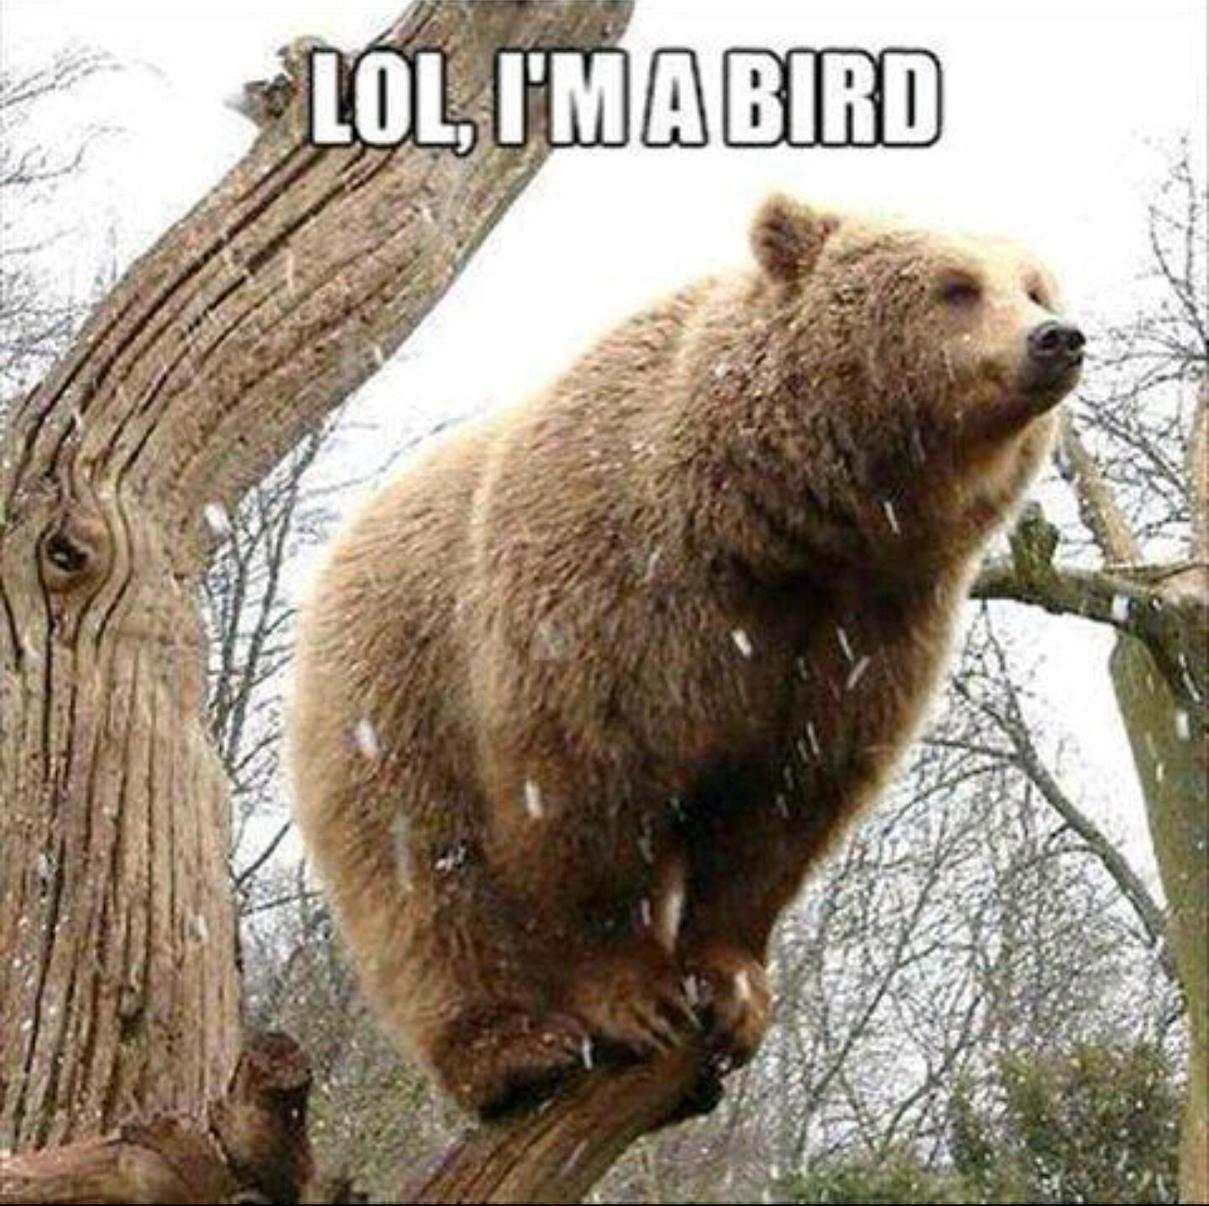 I forgot how to bear - Meme by shadow4ya :) Memedroid